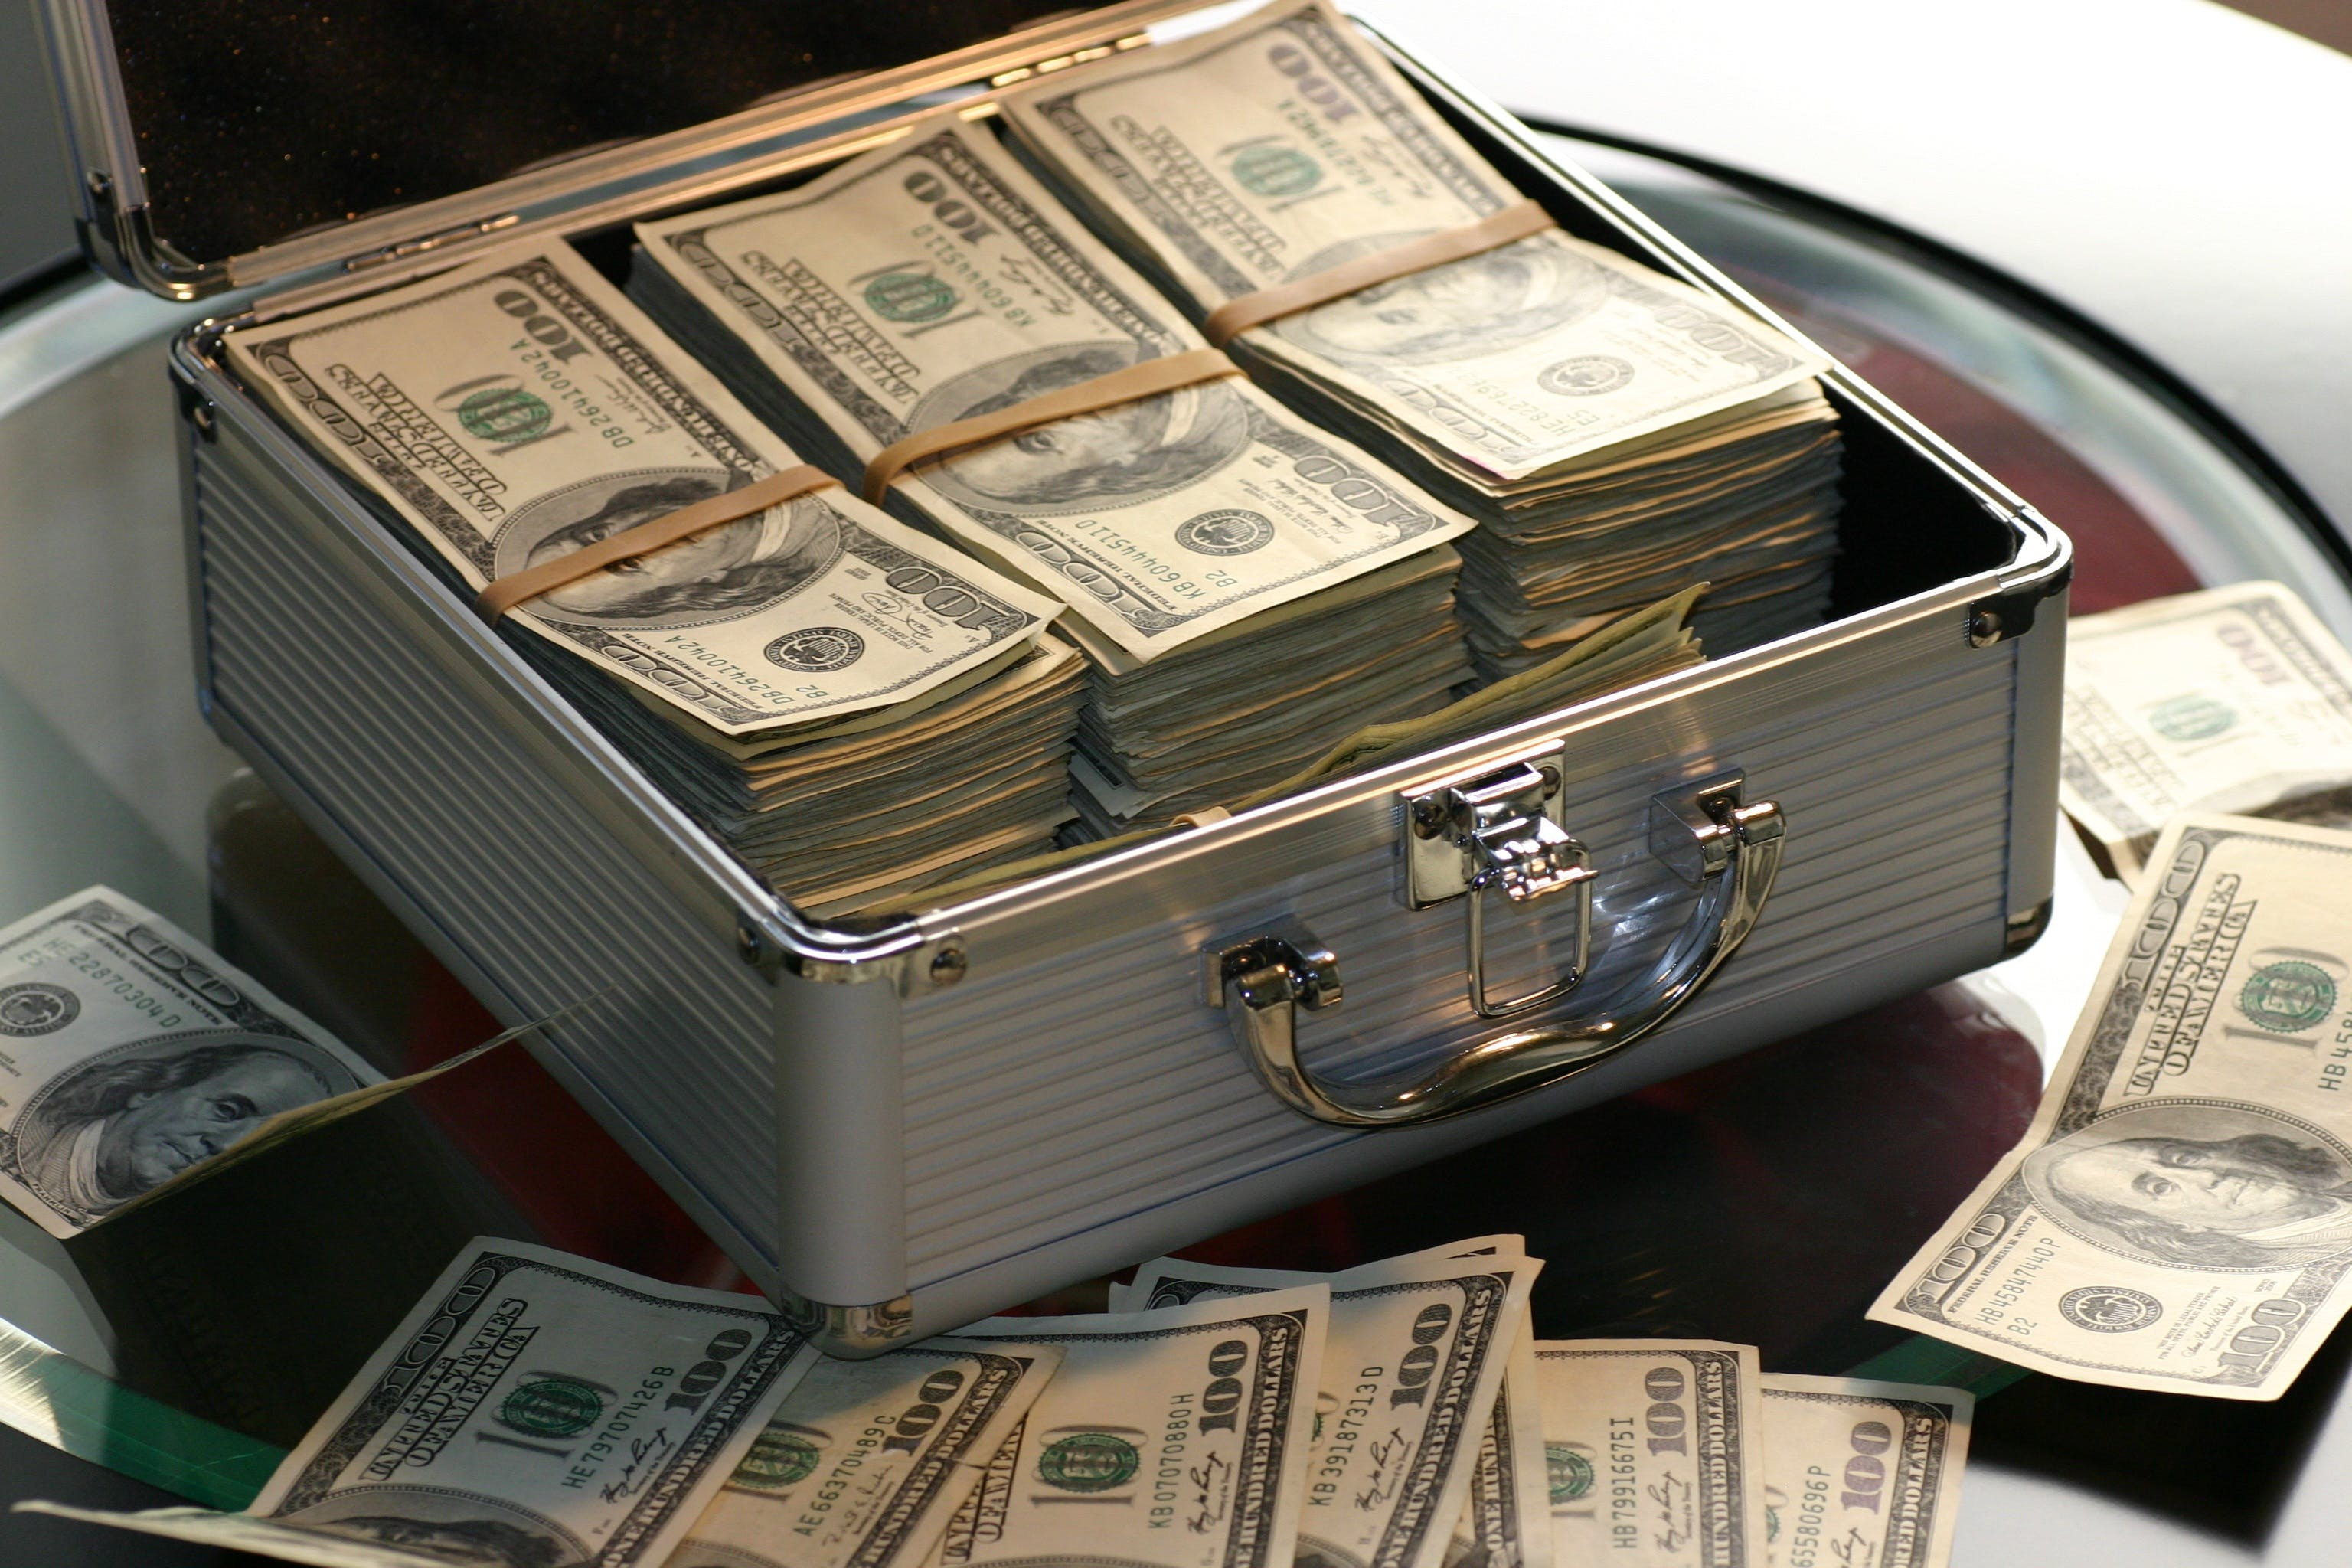 aktentasche, bank, banknoten